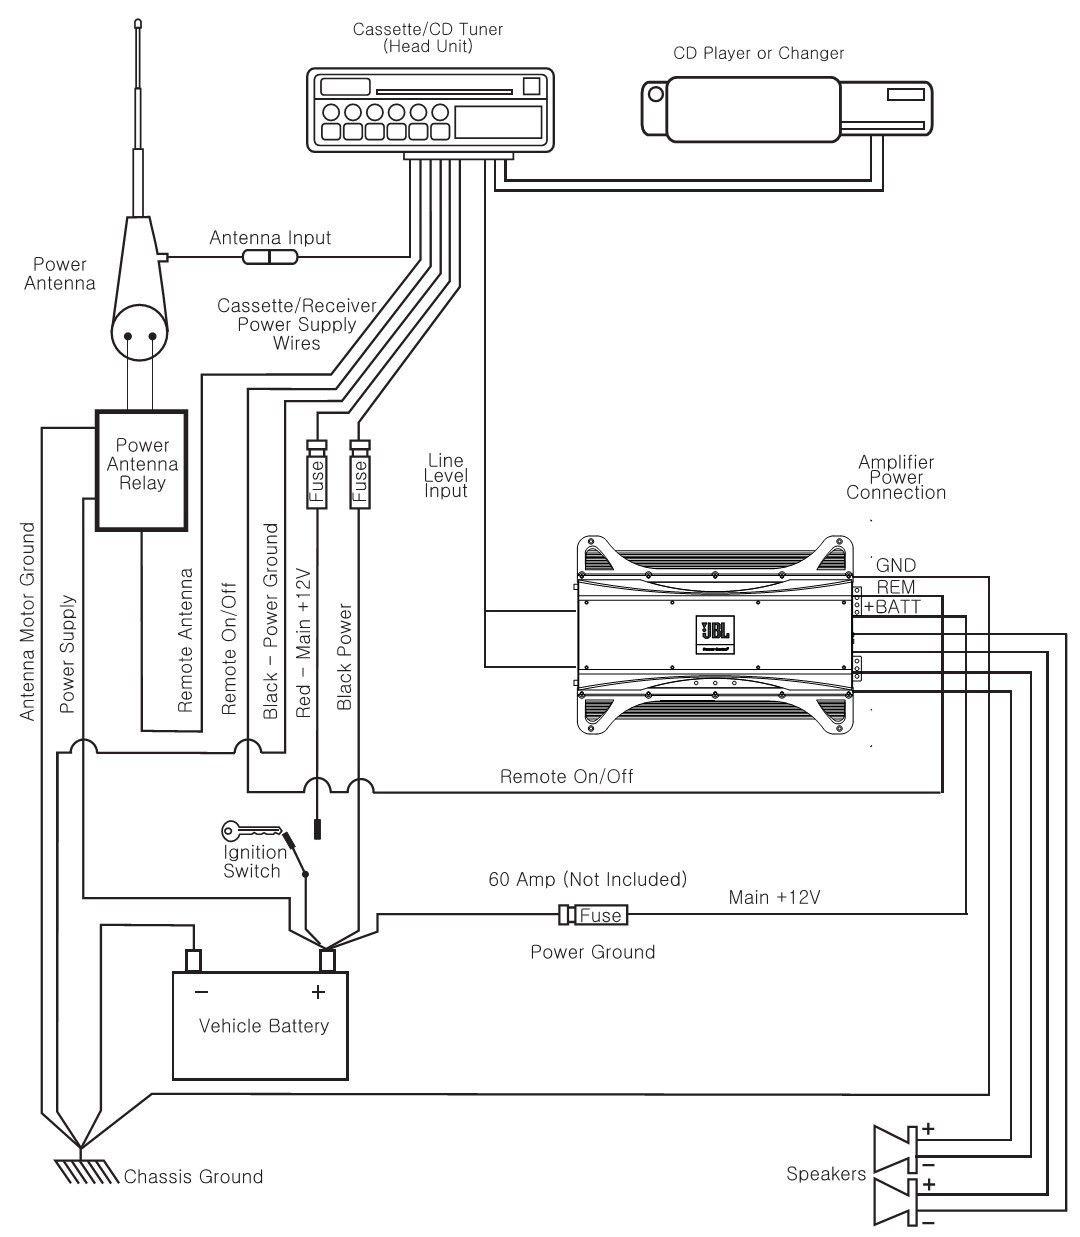 4 Channel Amp Wiring Diagram Elegant In 2020 Electrical Installation Led Light Installation Light Installation